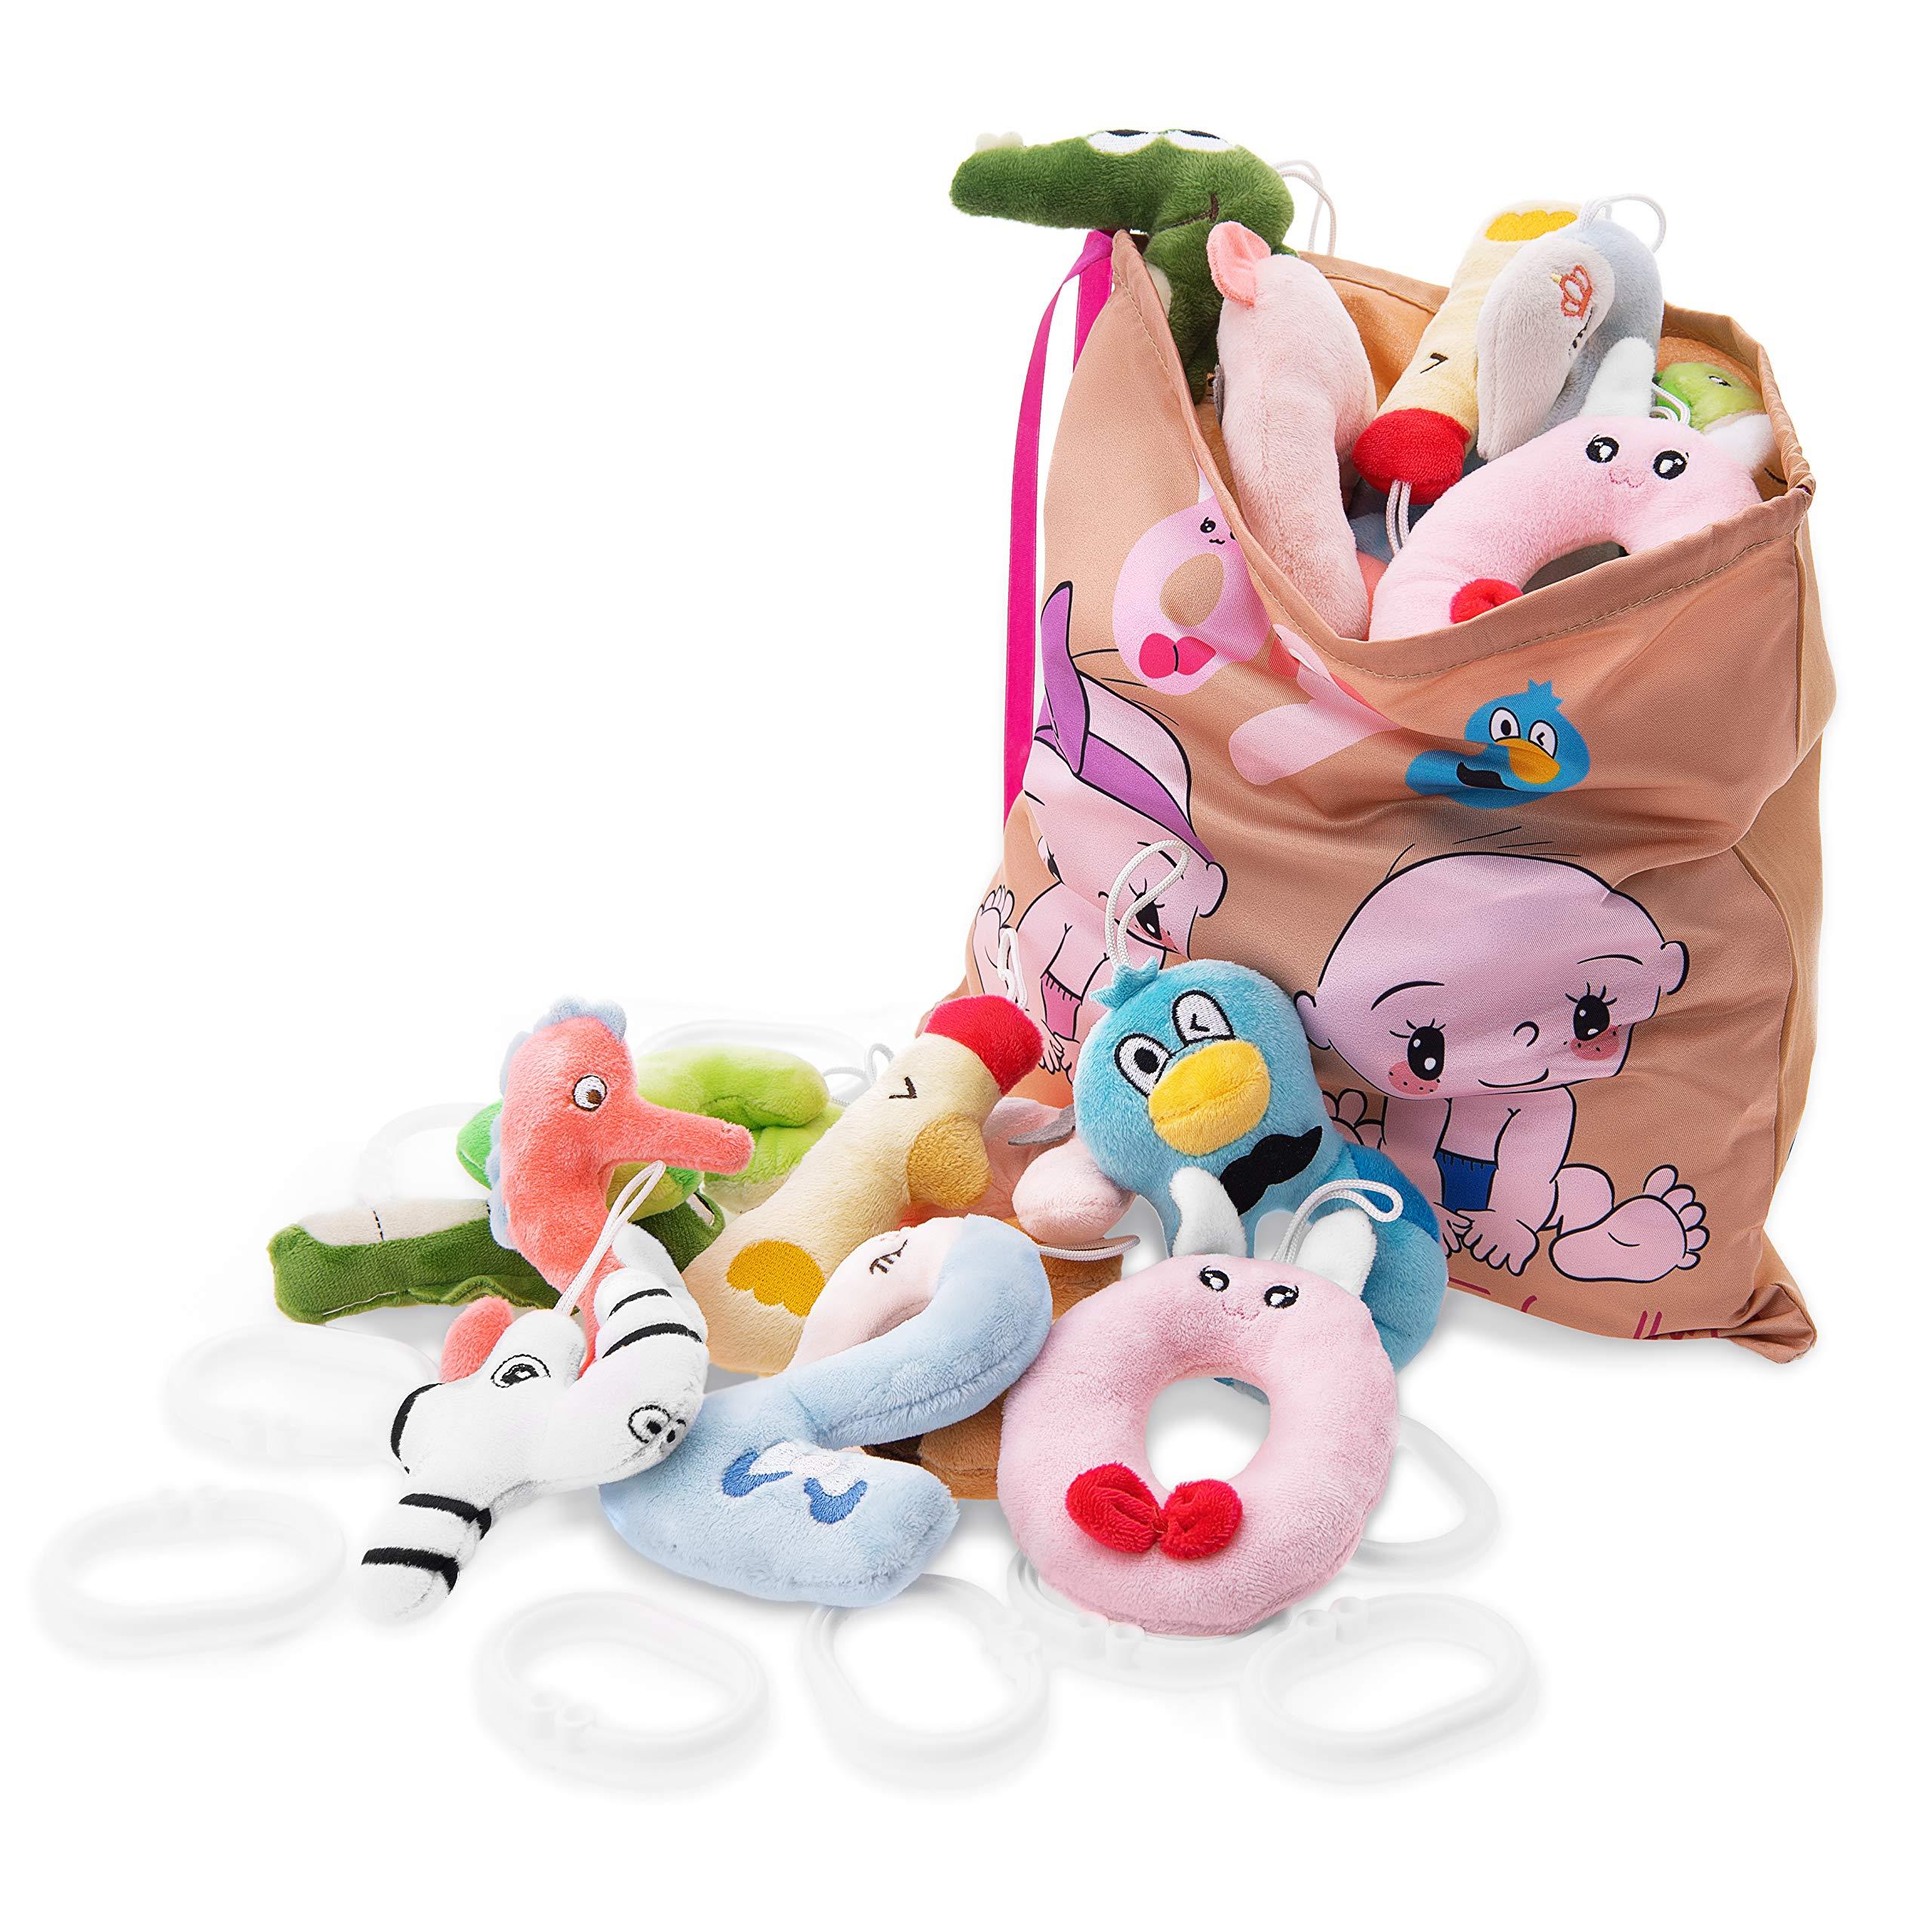 KLASSMIX Plush Montessori Toys for Toddlers - Set of Numbers & Storage Bag - Travel Stroller Quiet Toys - Carseat Toys for Infants - Montessori Toys for Toddlers